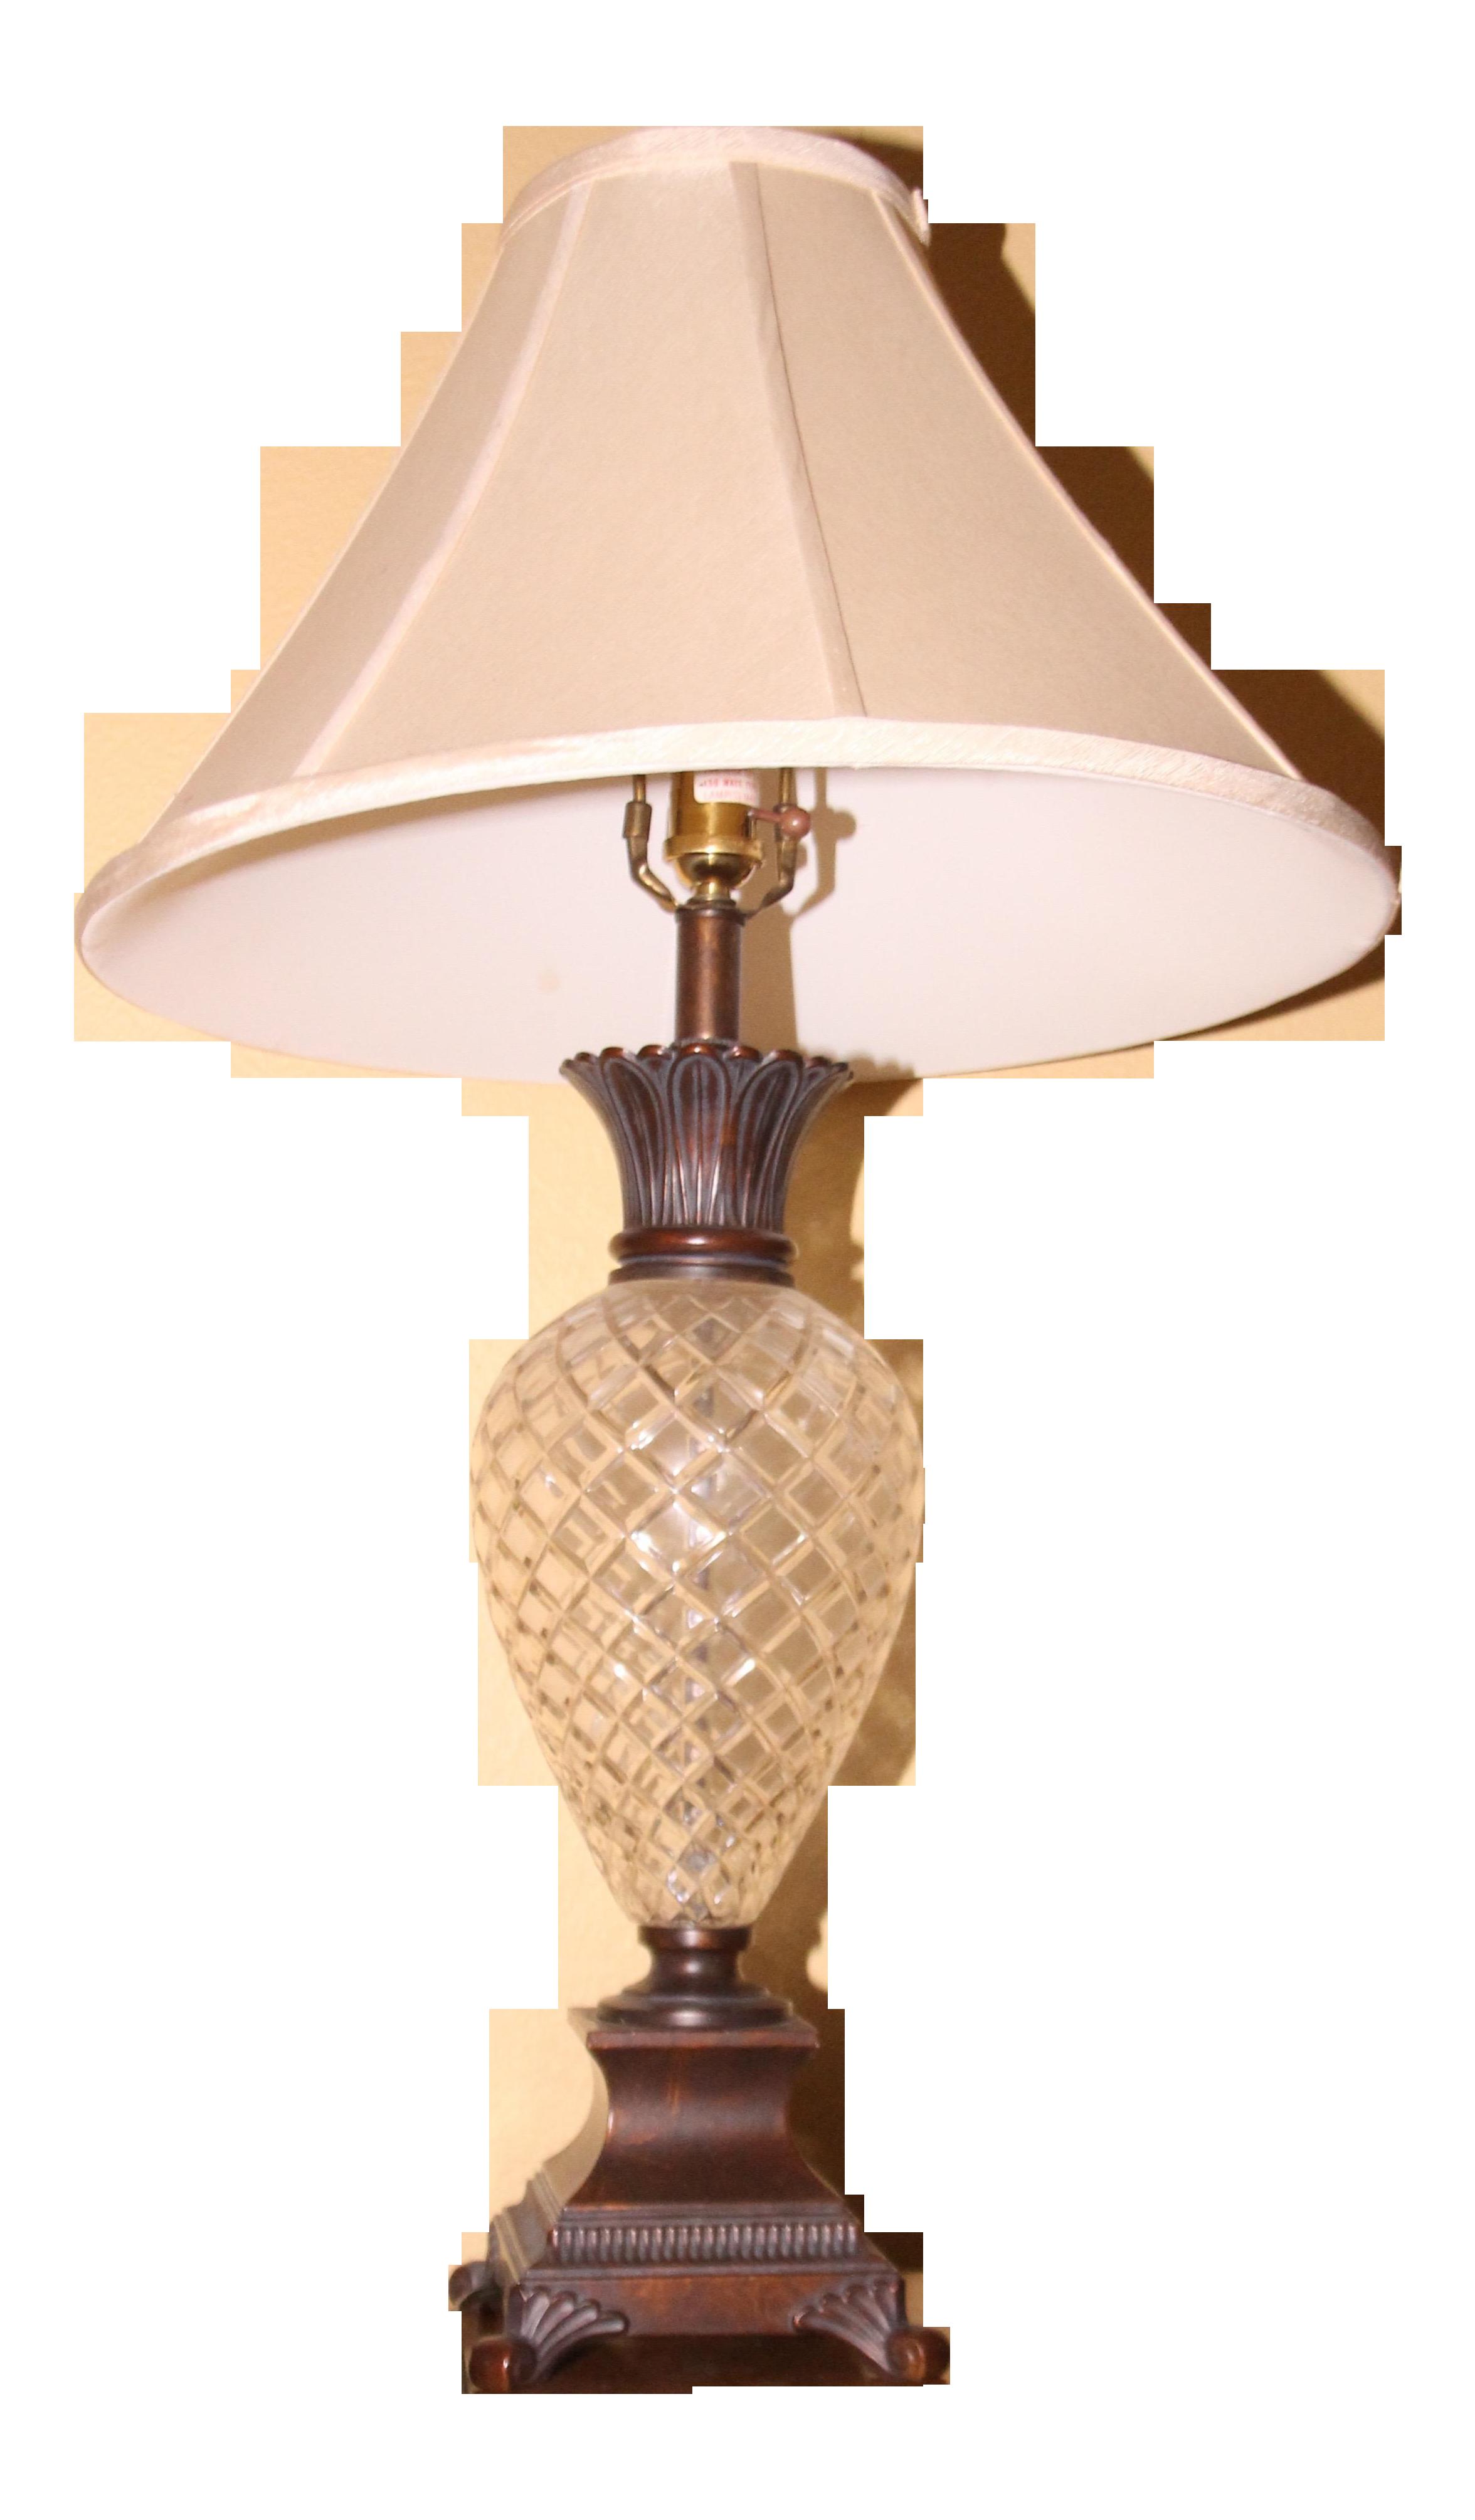 Ethan allen pineapple lamp